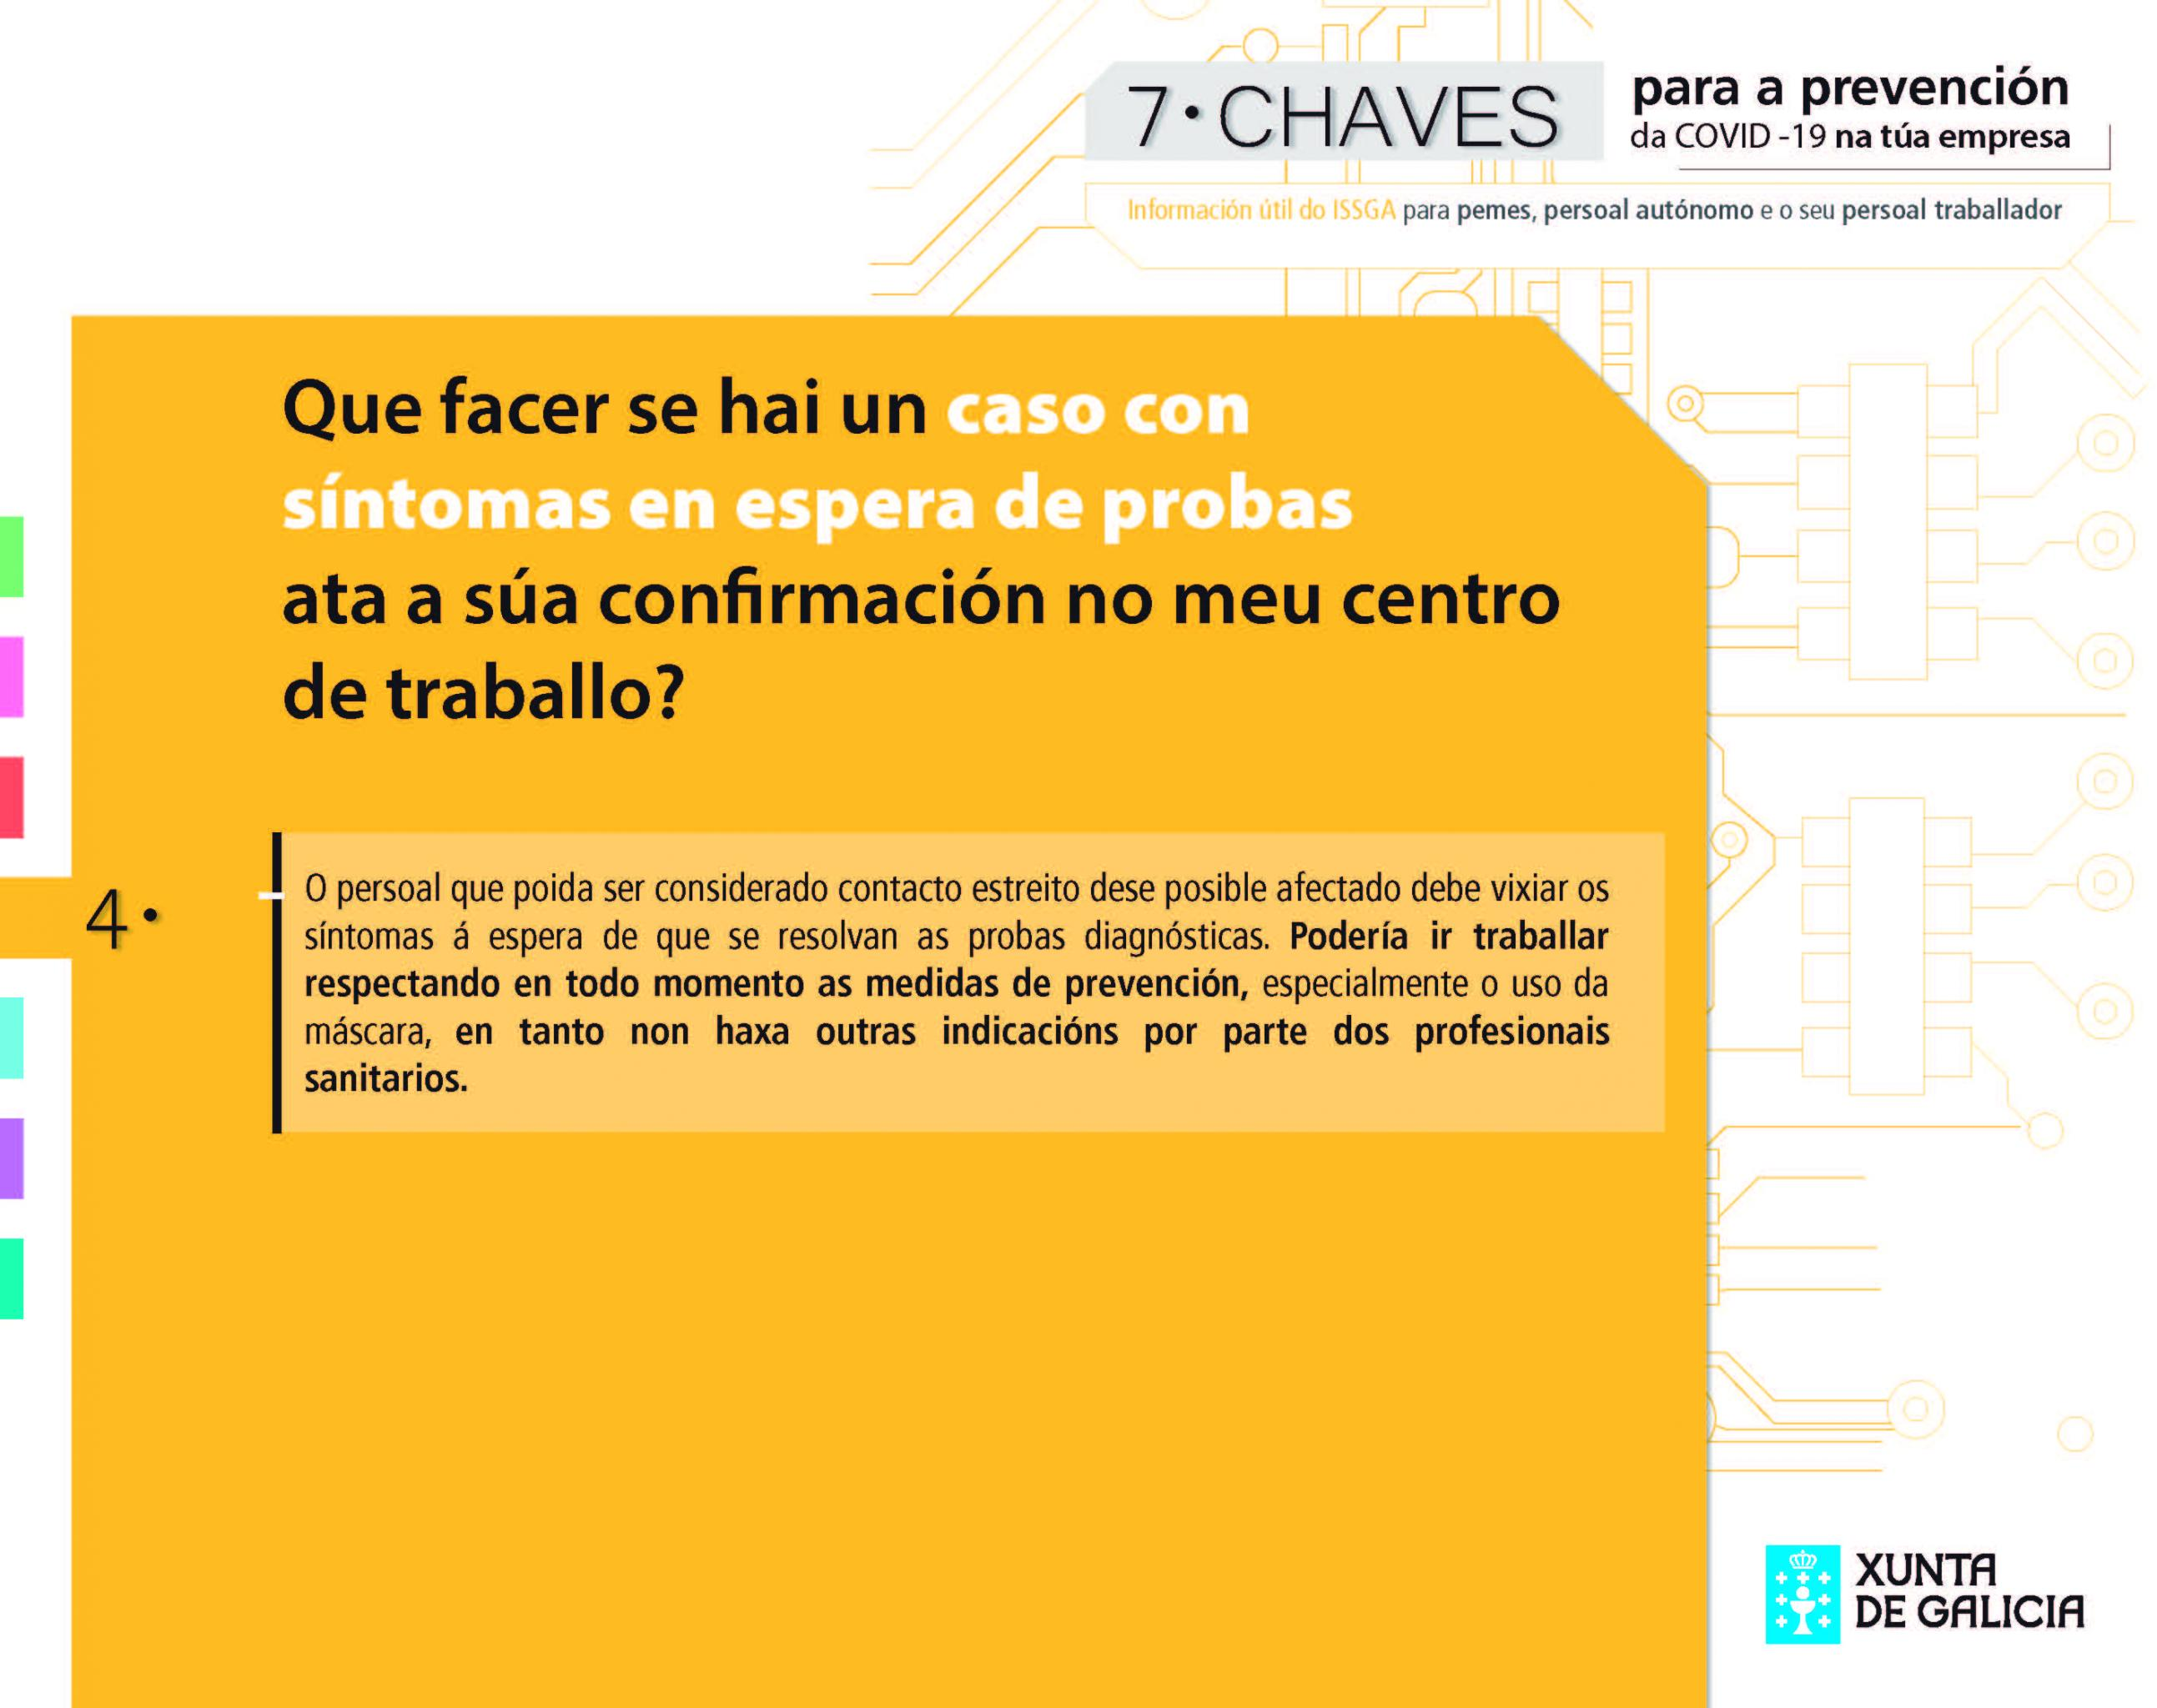 7_chaves_covid_Página_5.jpg